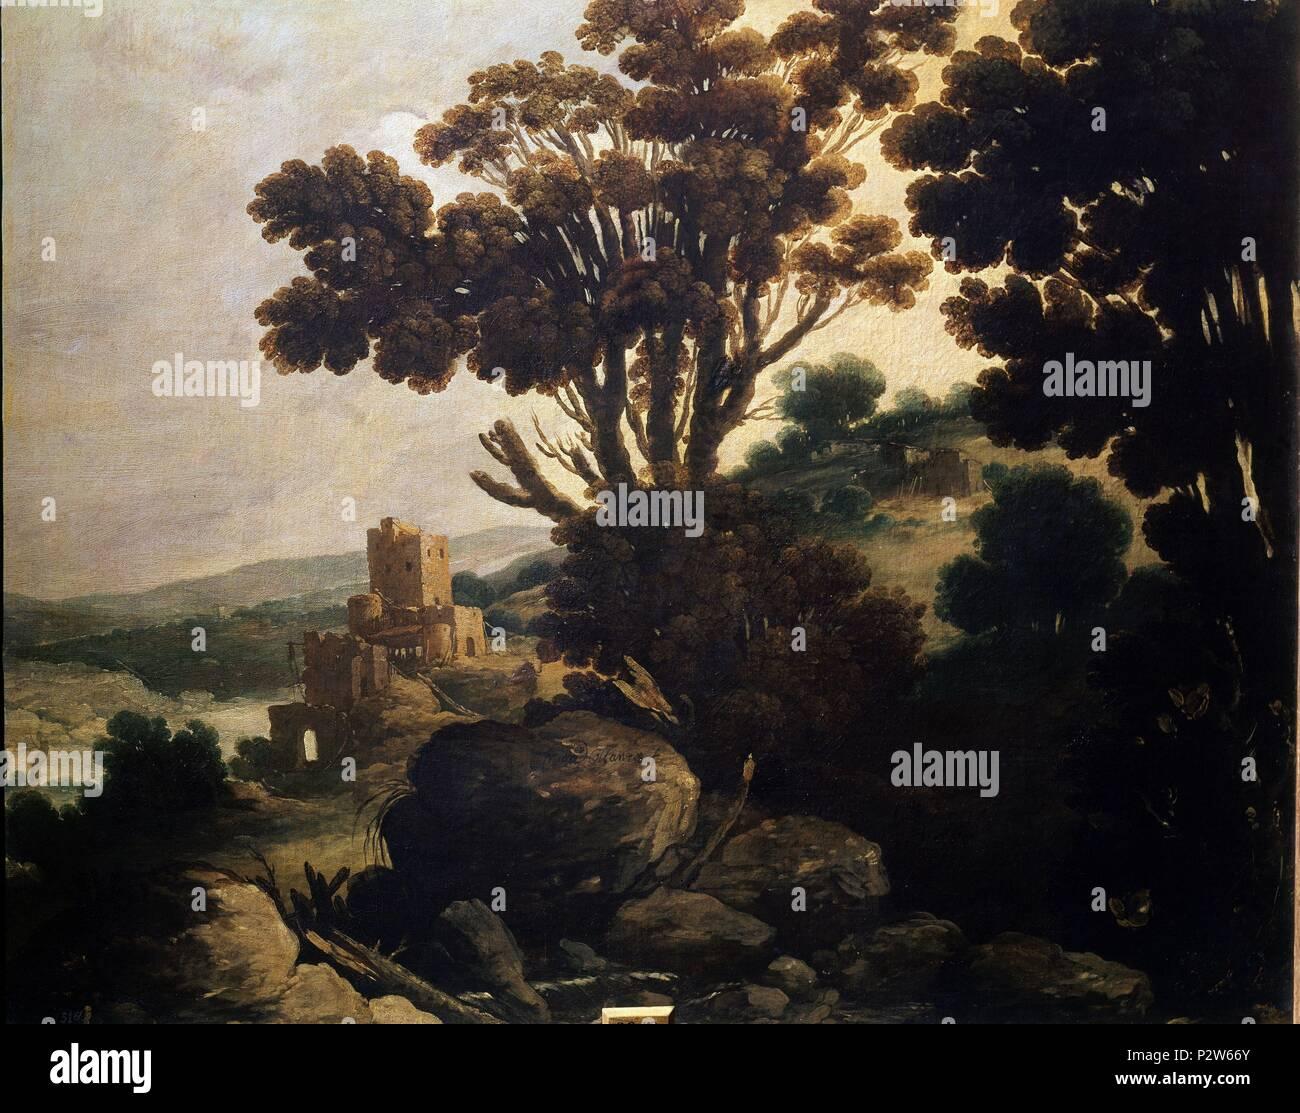 'Landscape', 17th century, Oil on canvas, 75 x 92 cm, Spanish Baroque. Author: Francisco Collantes (1599-1656). Location: MUSEO DEL PRADO-PINTURA, MADRID, SPAIN. - Stock Image